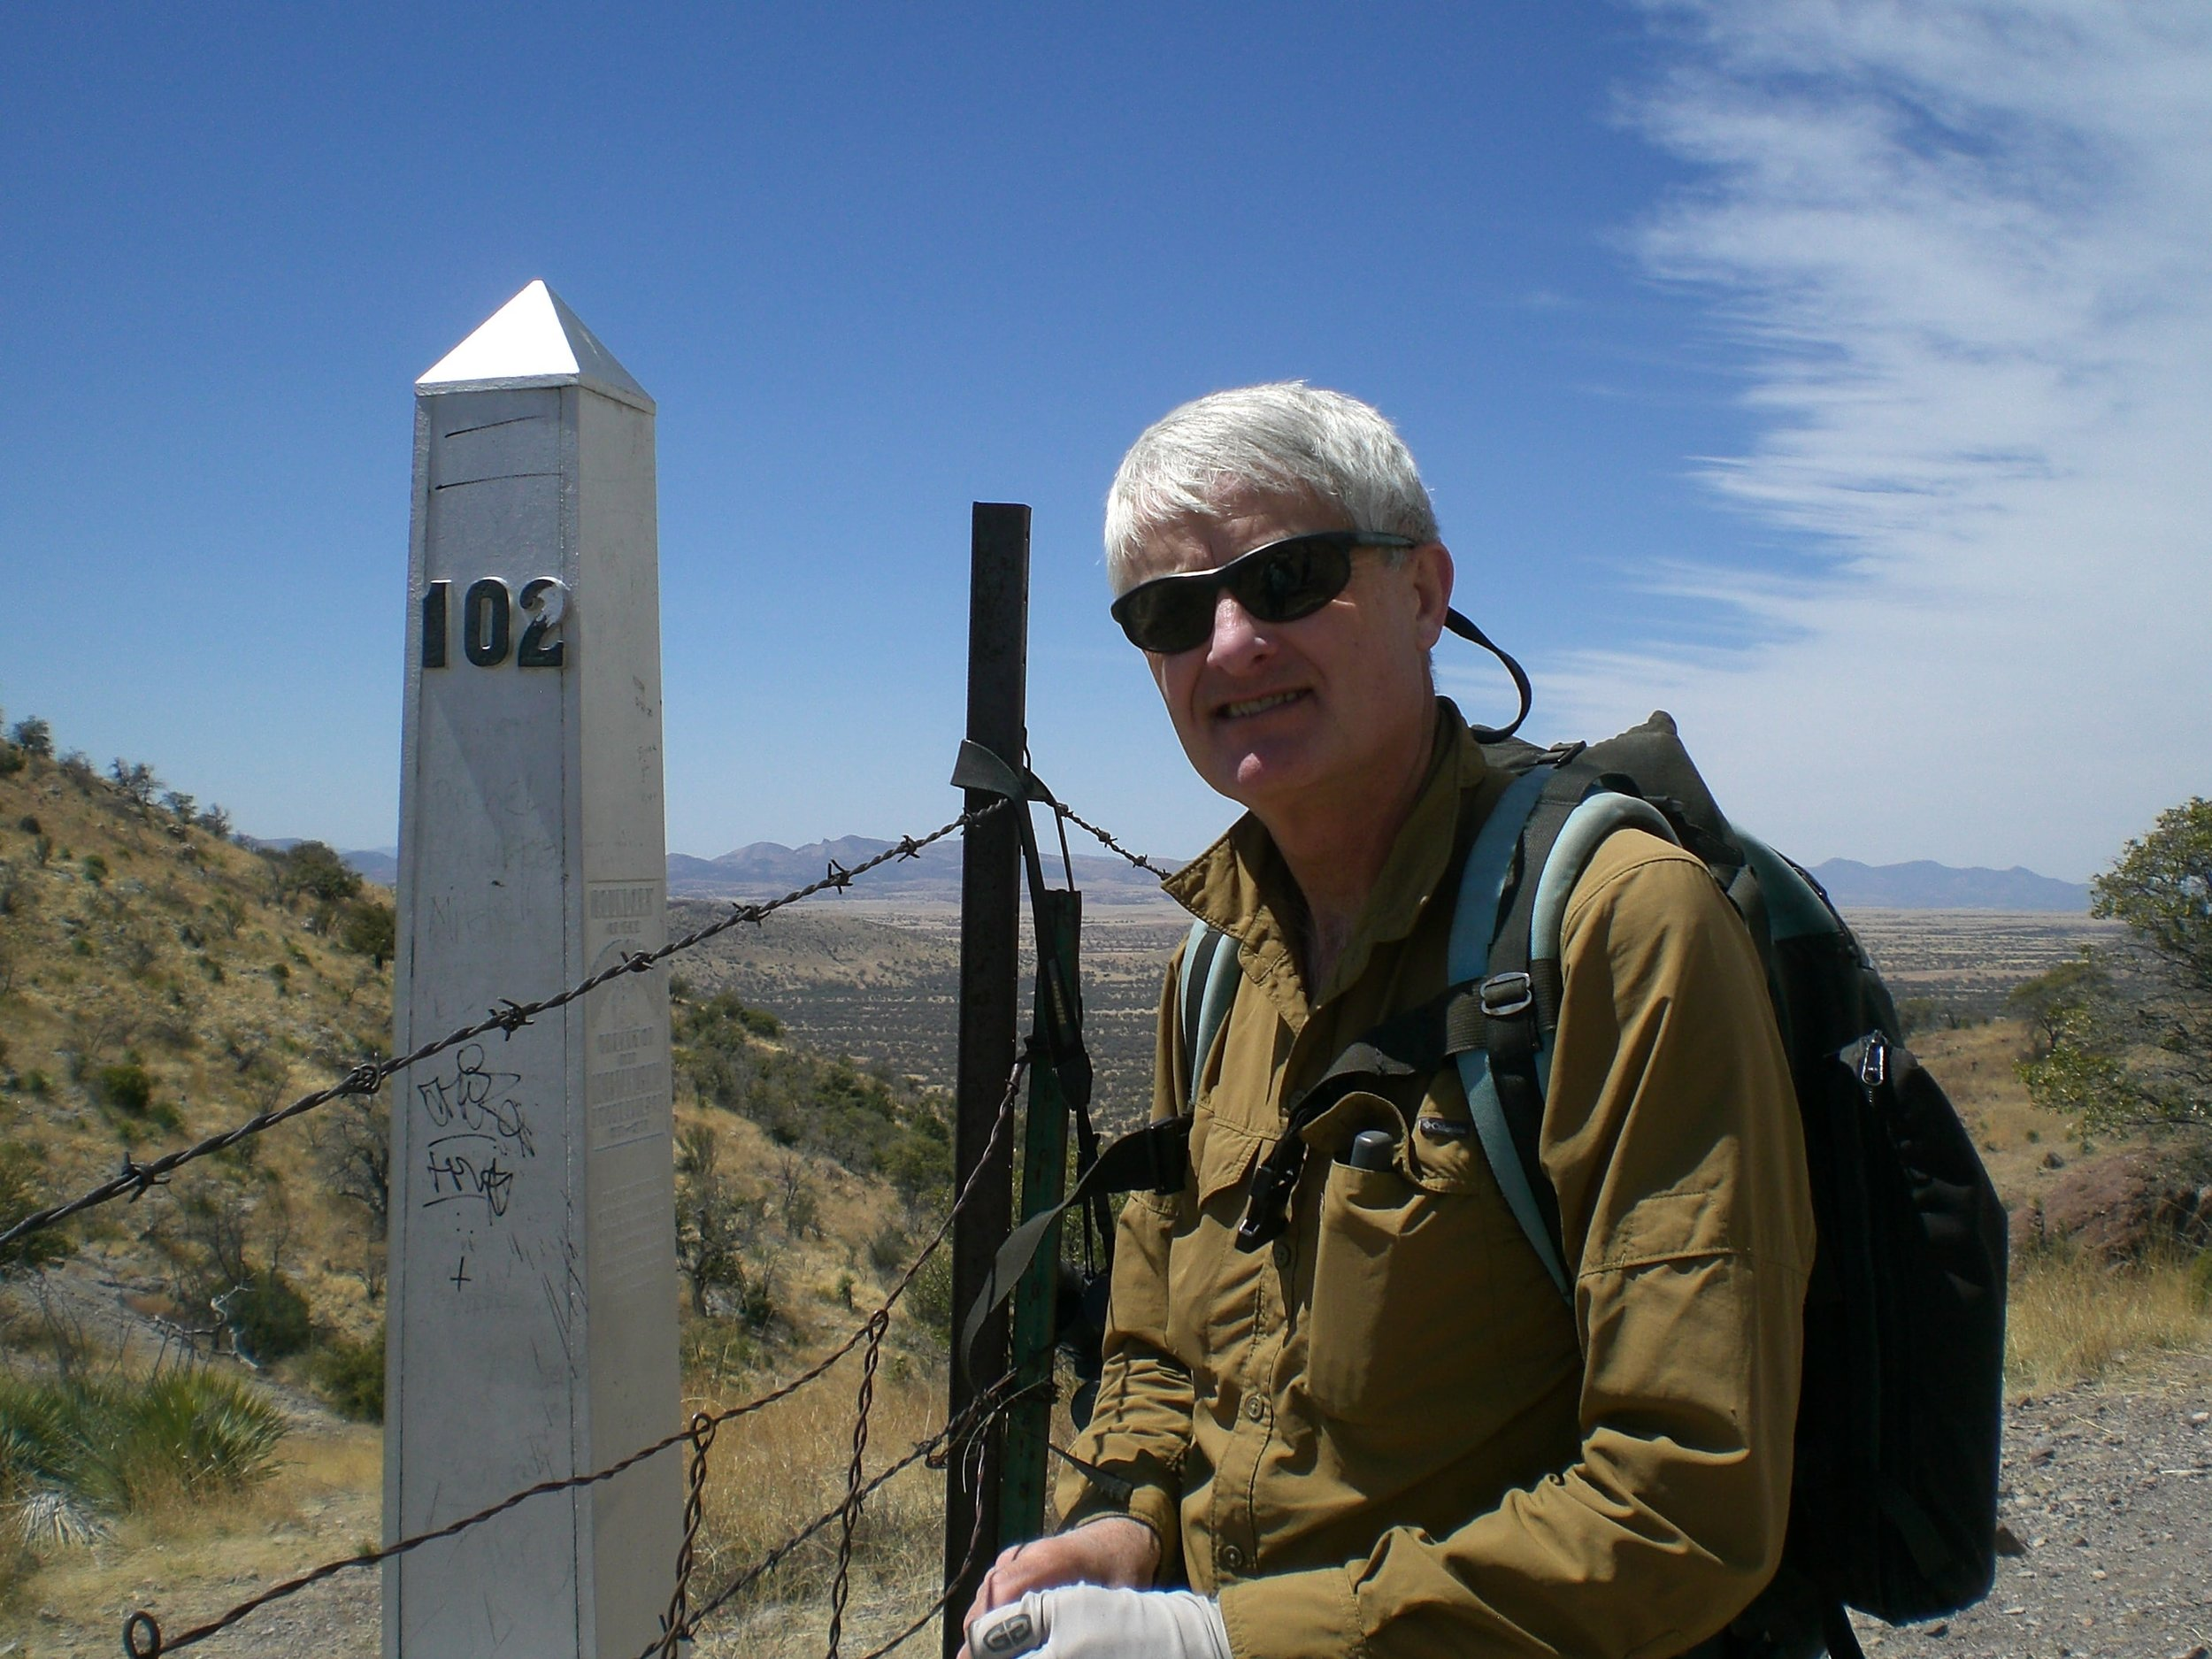 Steve On The Arizona Trail